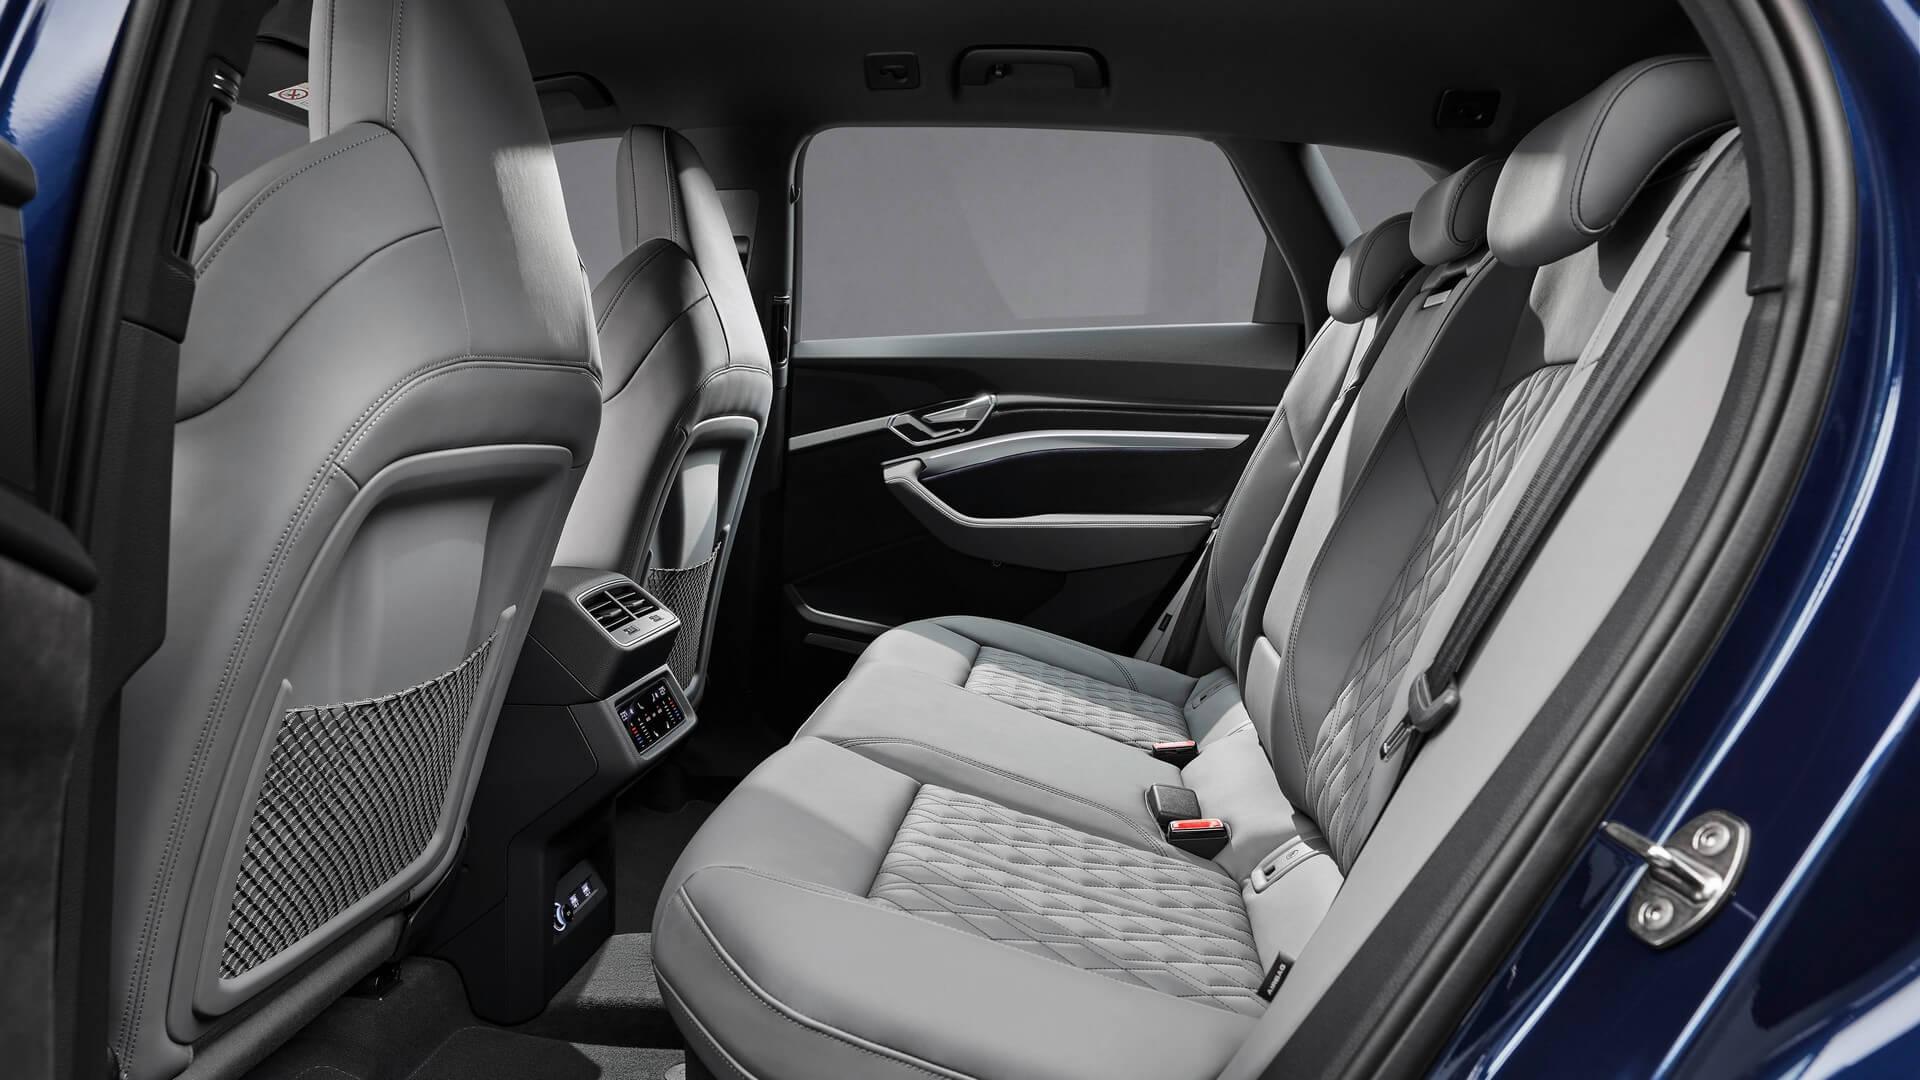 Audi-E-Tron-S-and-E-Tron-S-Sportback-2020-106